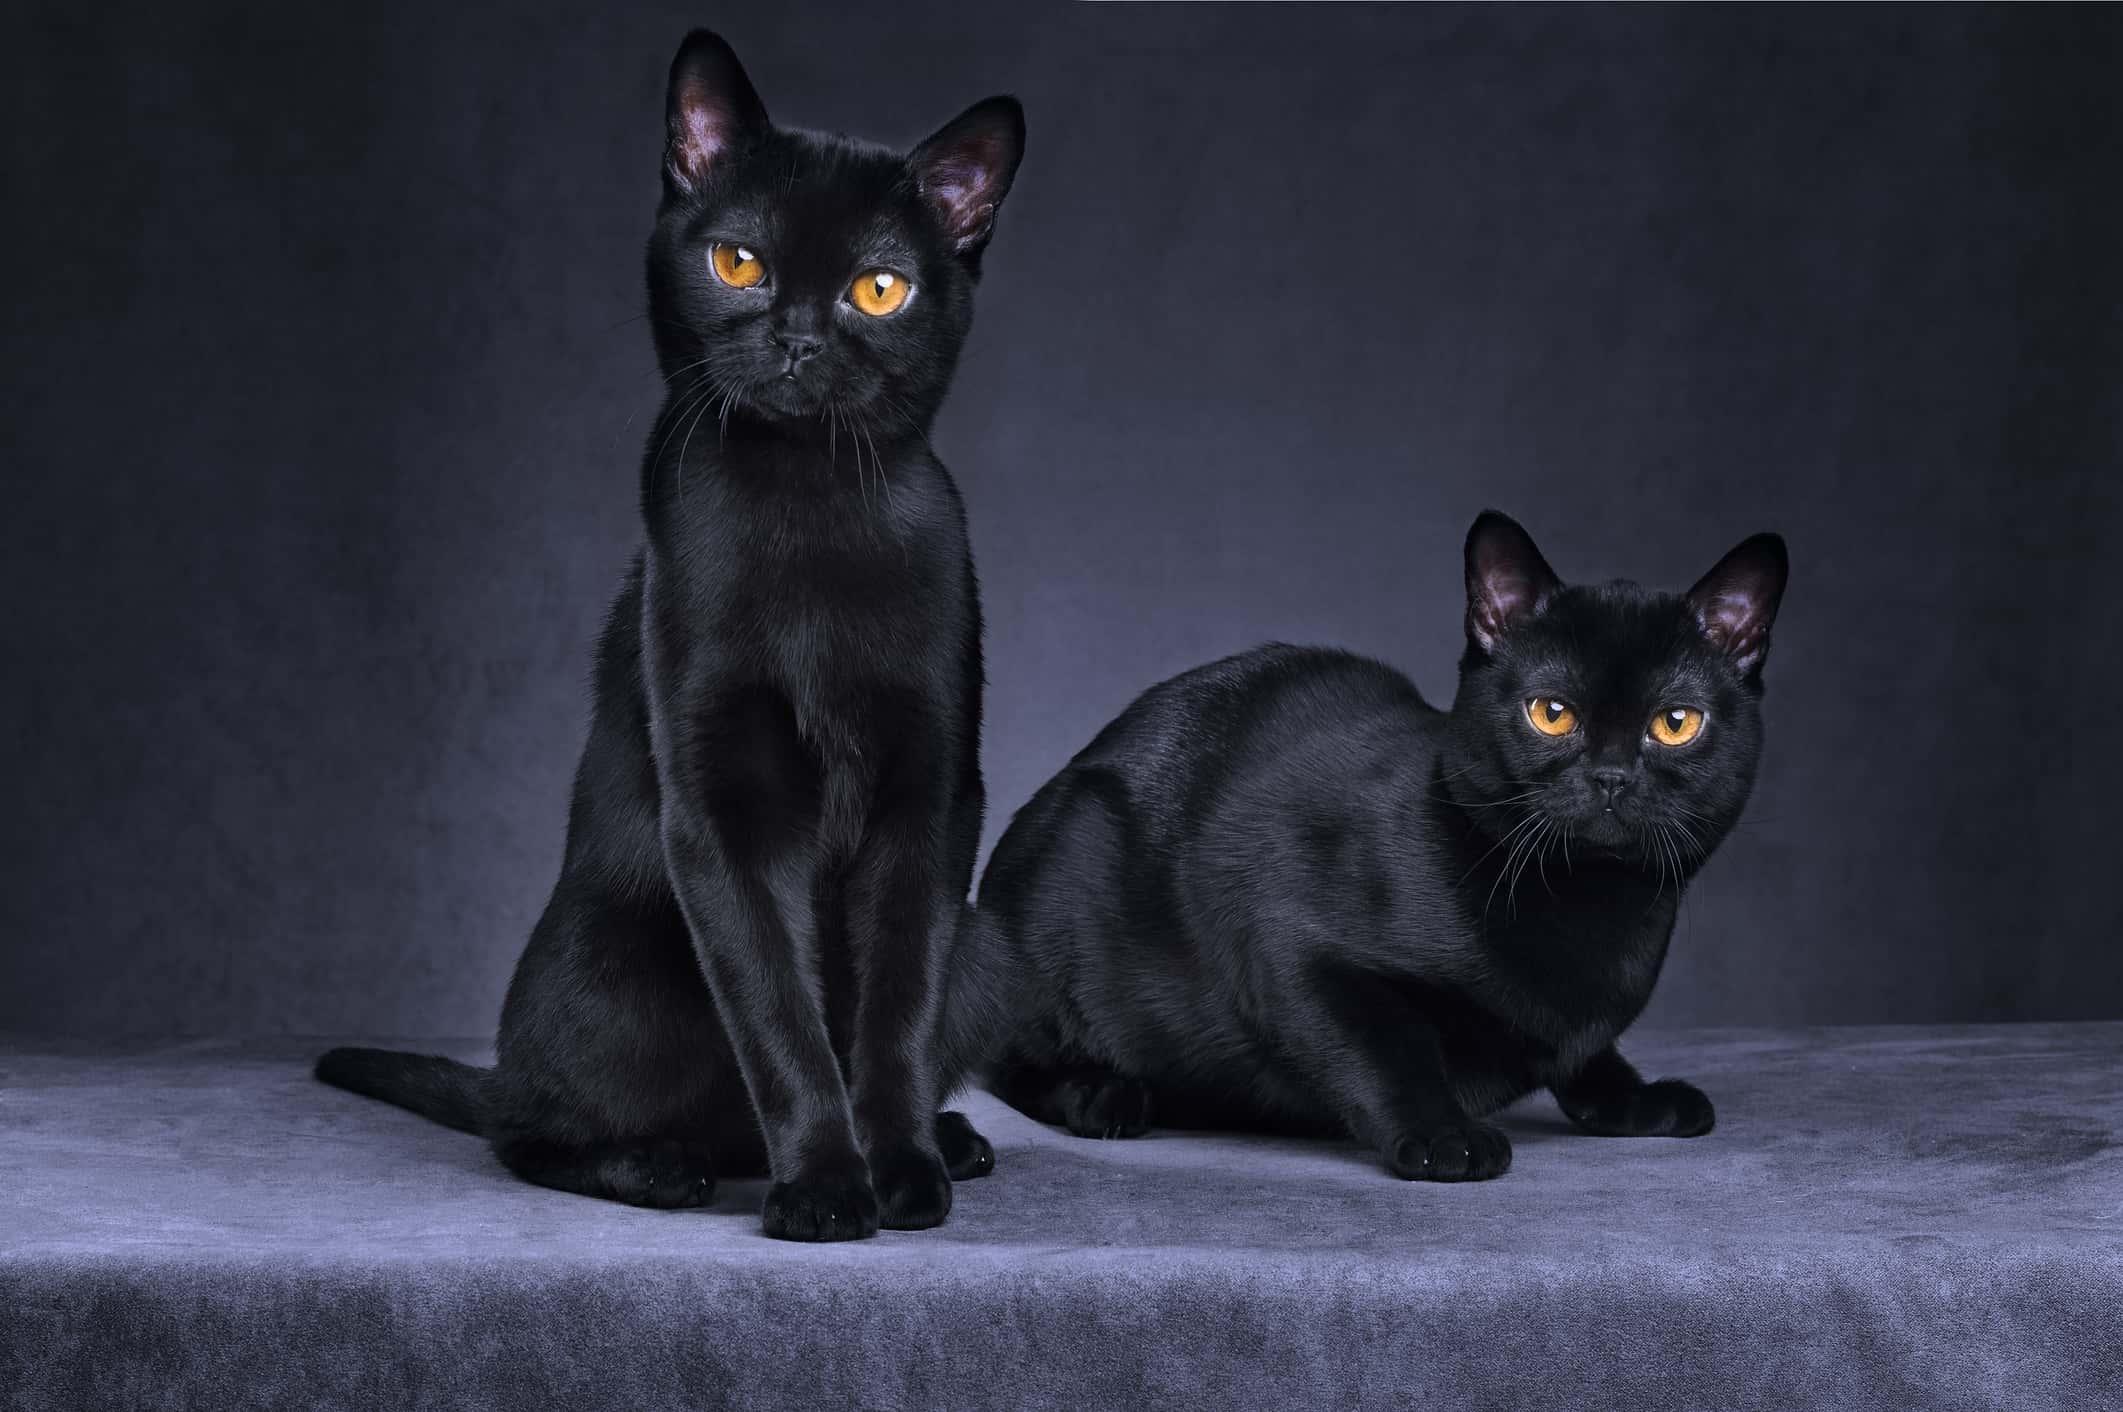 Portrait of two Black cats.